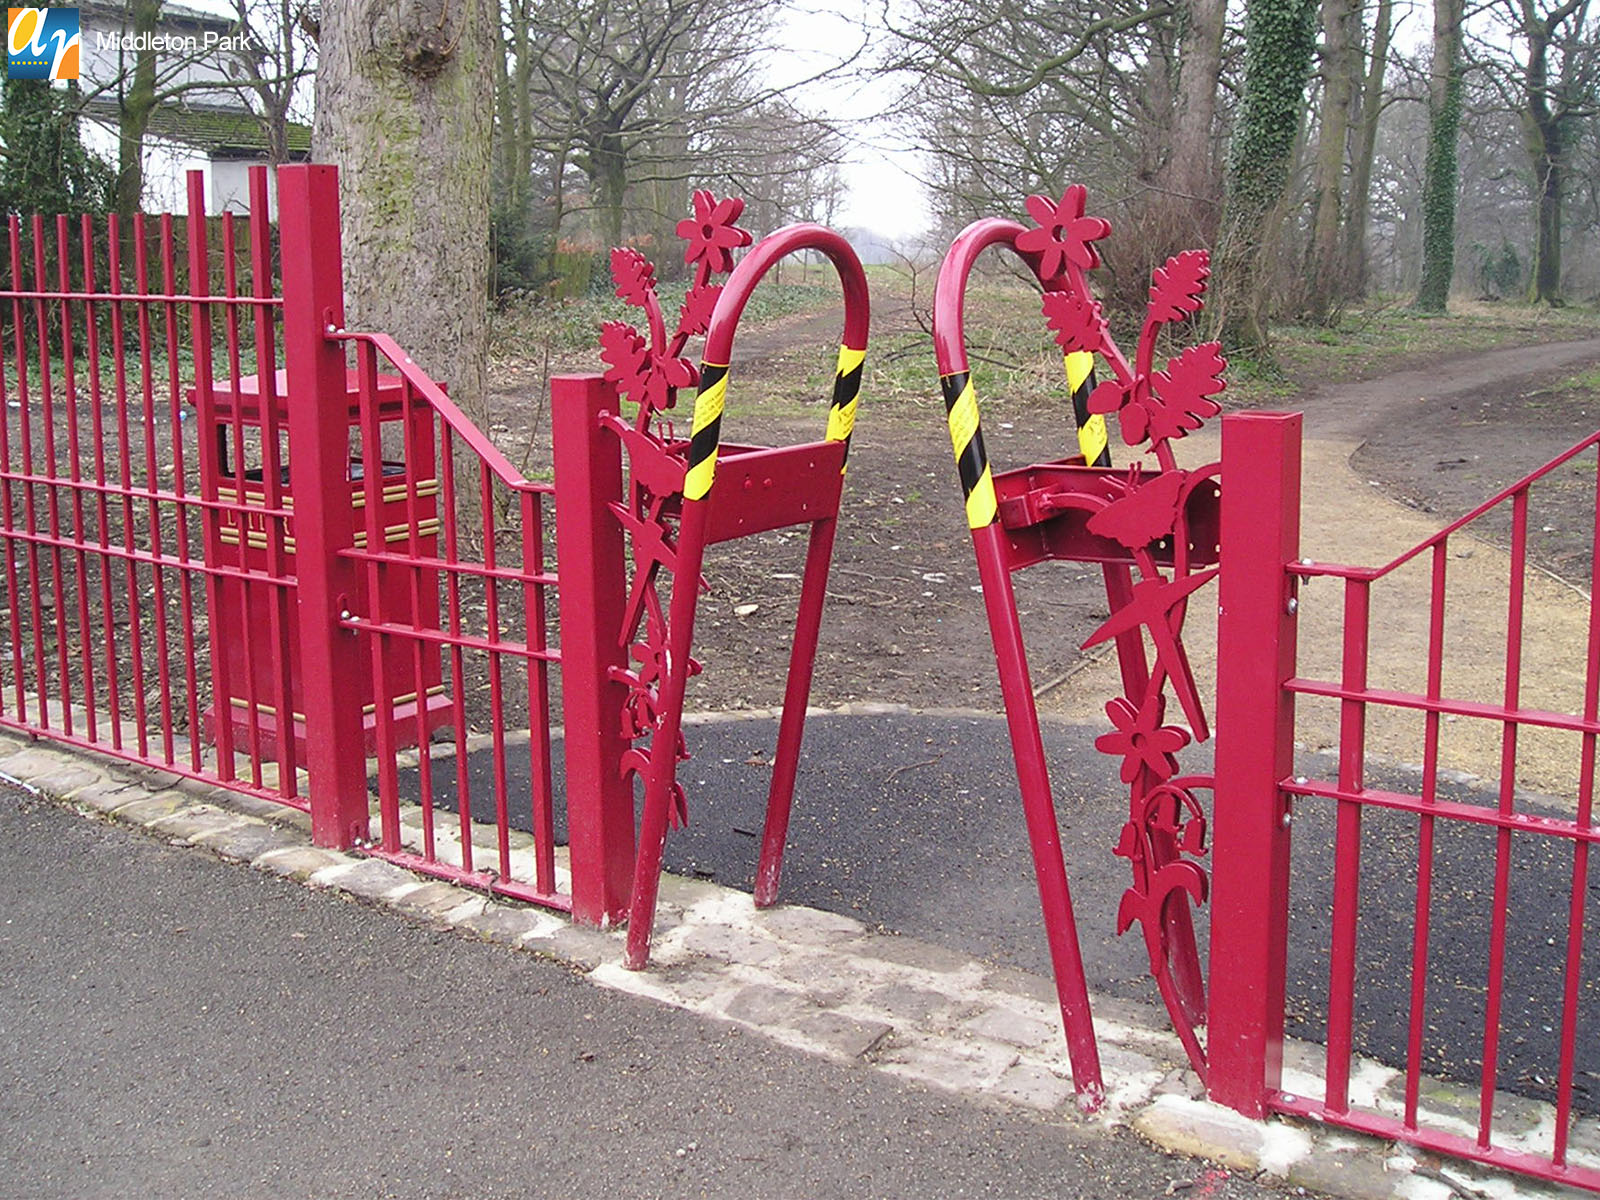 Middleton park bespoke metalwork